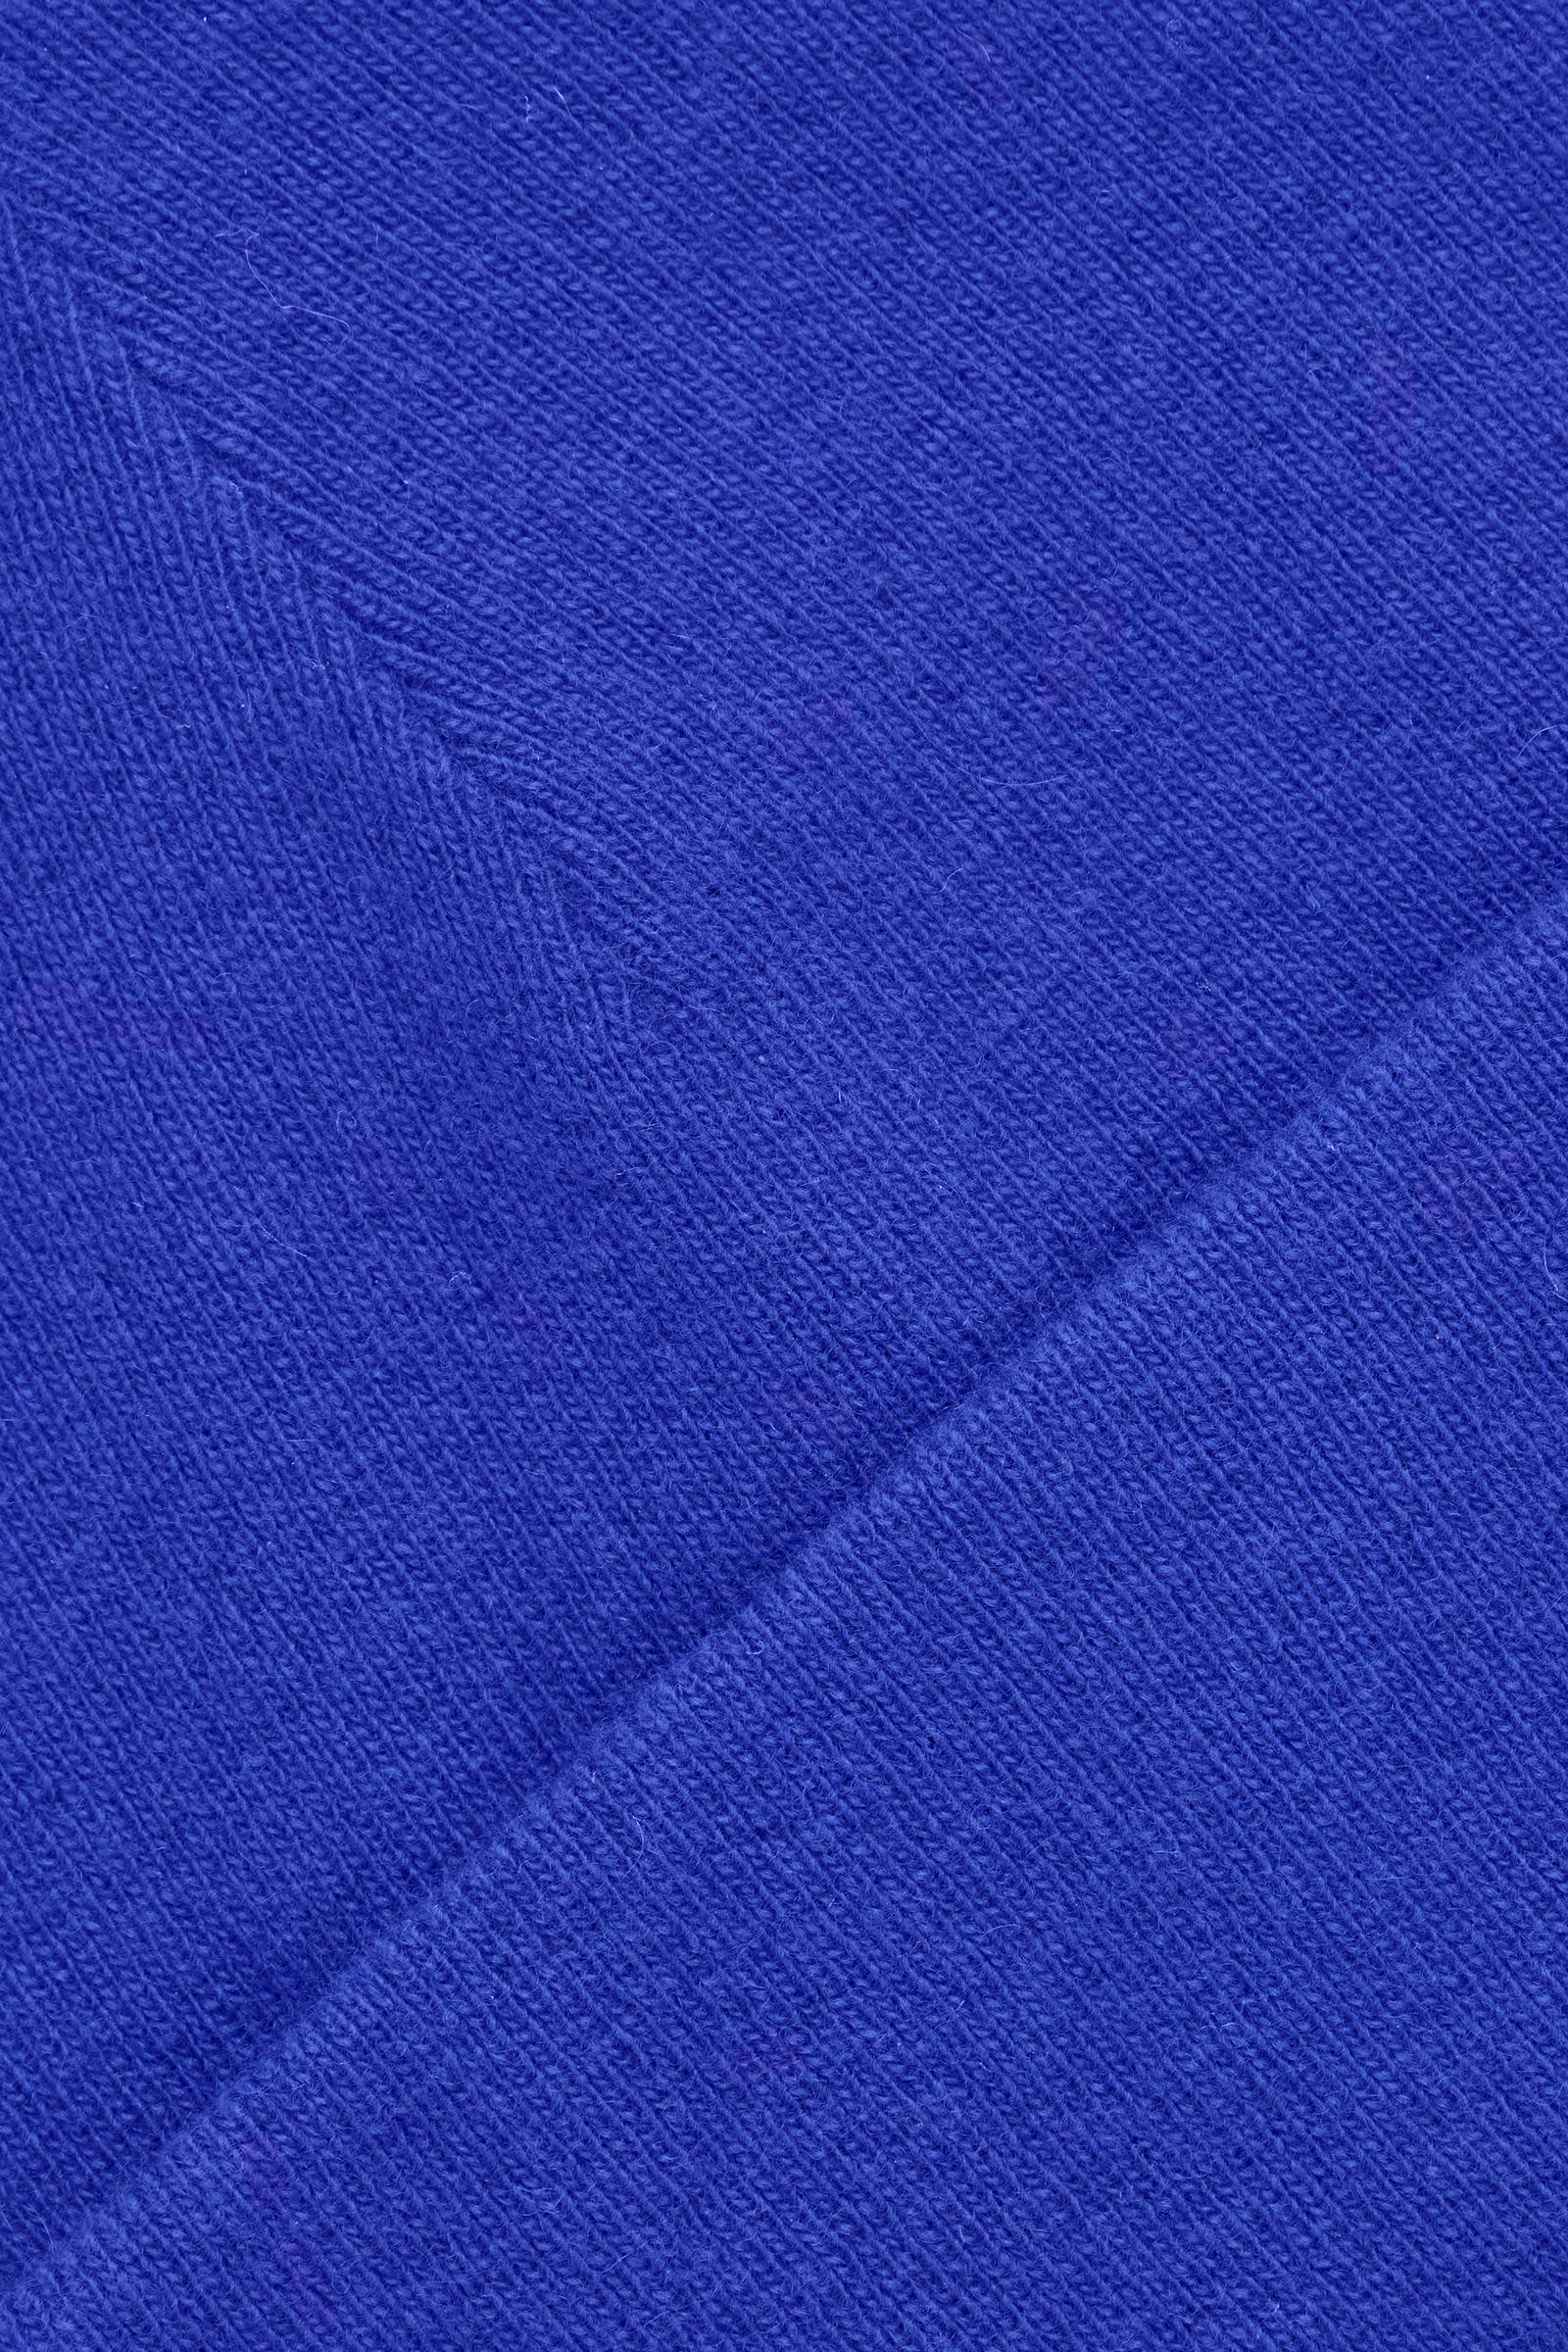 COS 폴디드 울 비니의 브라이트 블루컬러 Detail입니다.